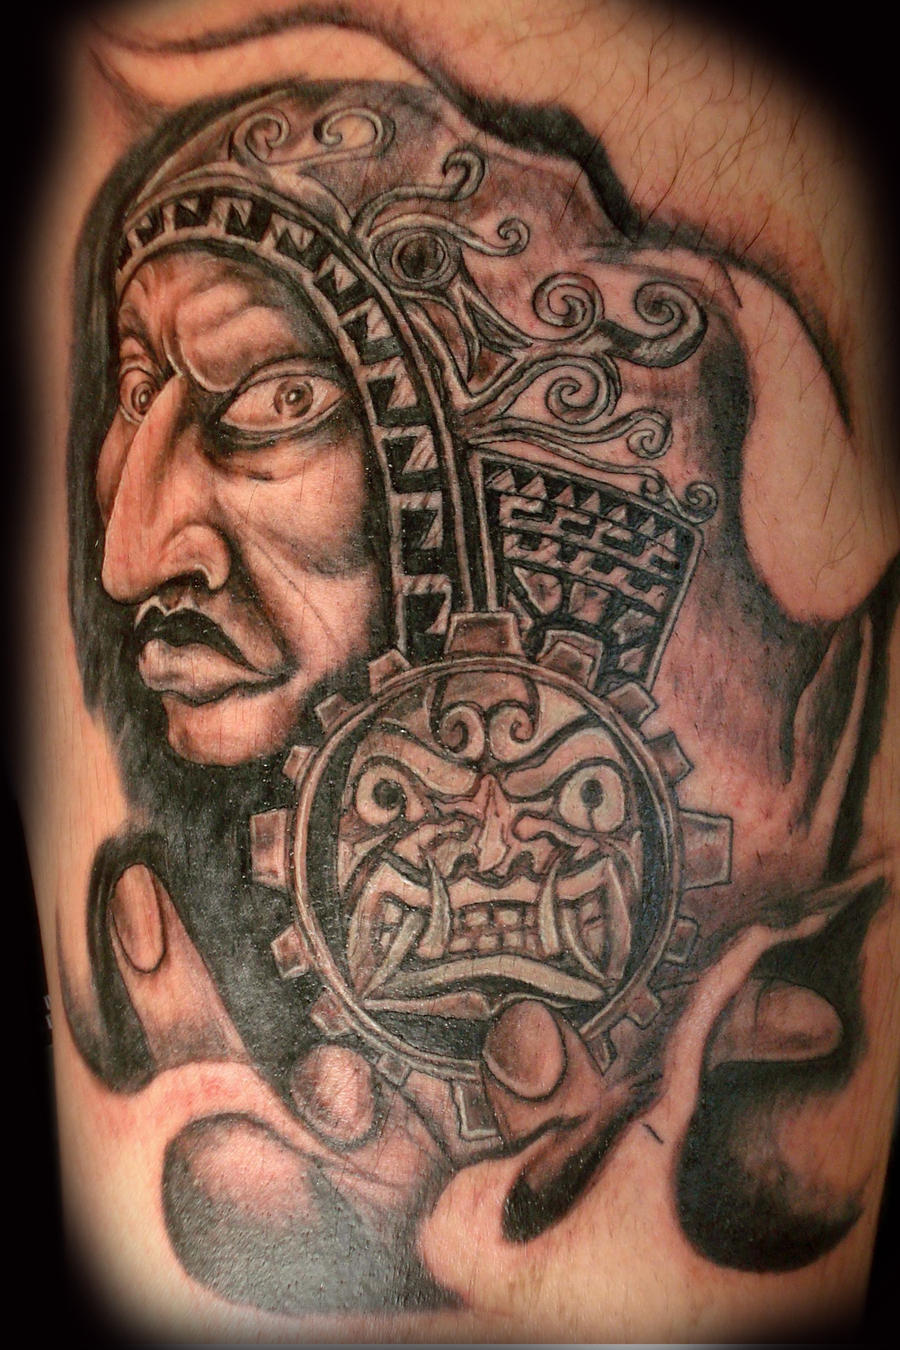 Peru tattoo by henrysayasart on deviantart for Peruvian tattoos designs